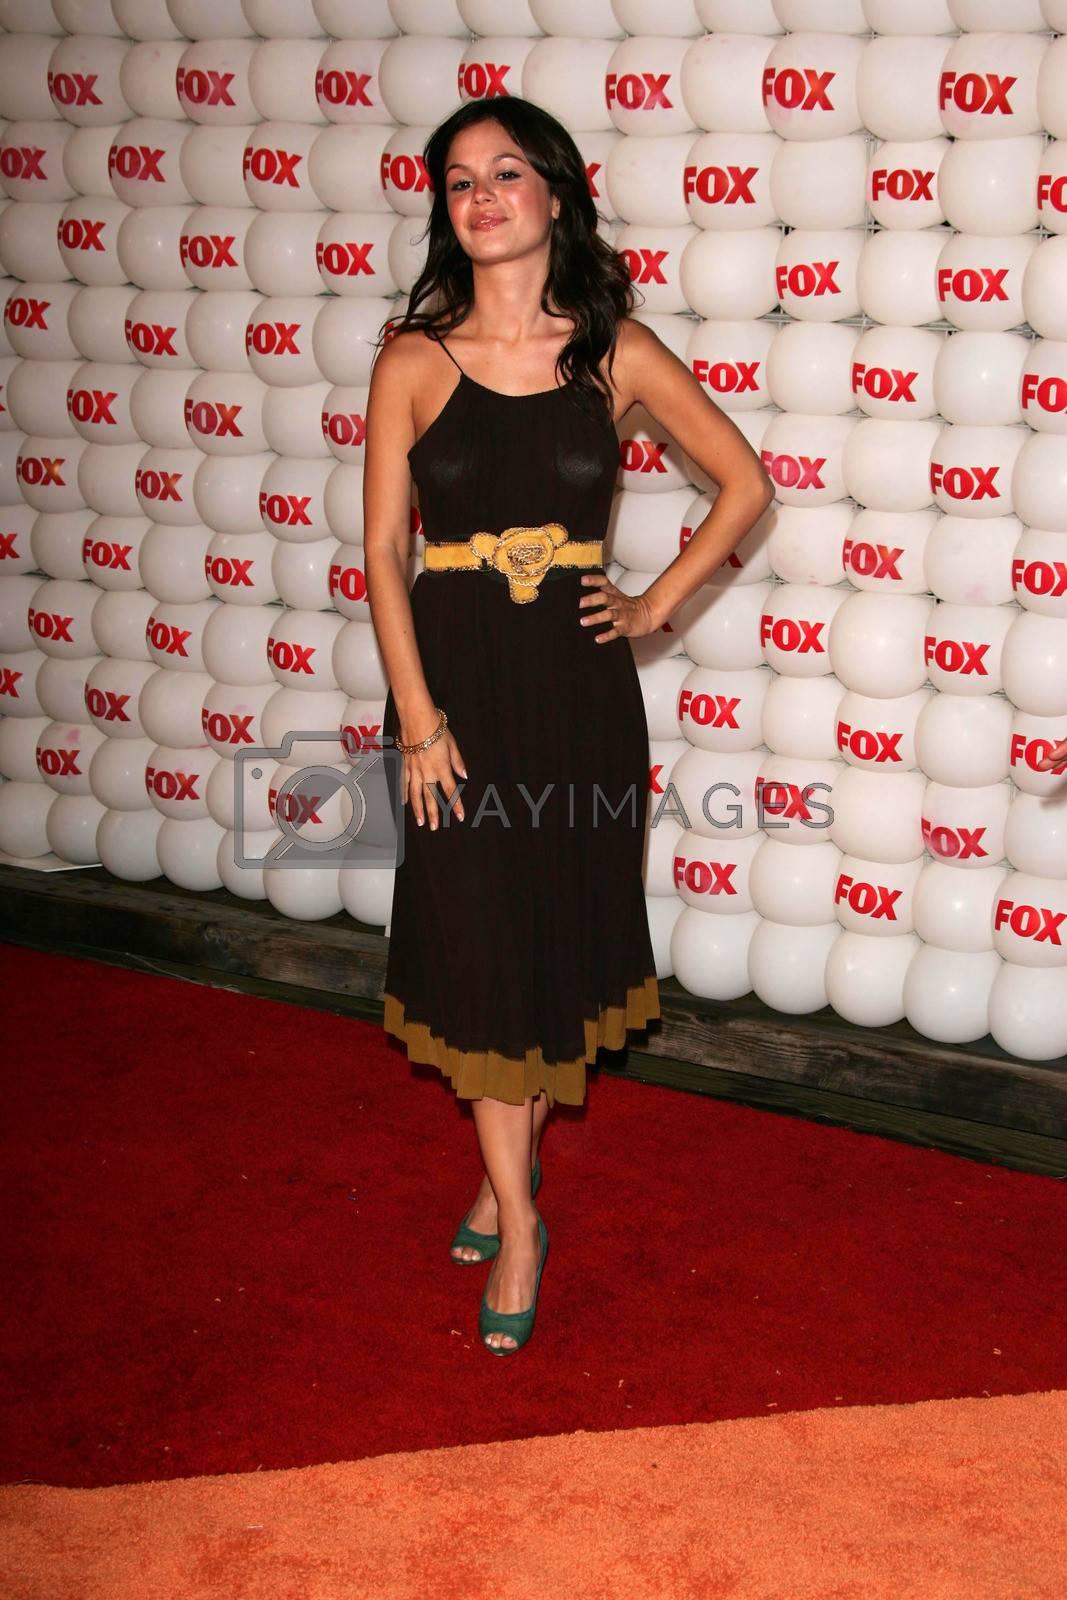 Rachel Bilson At the FOX Summer 2005 TCA Party, Santa Monica Pier, Santa Monica, CA 07-29-05